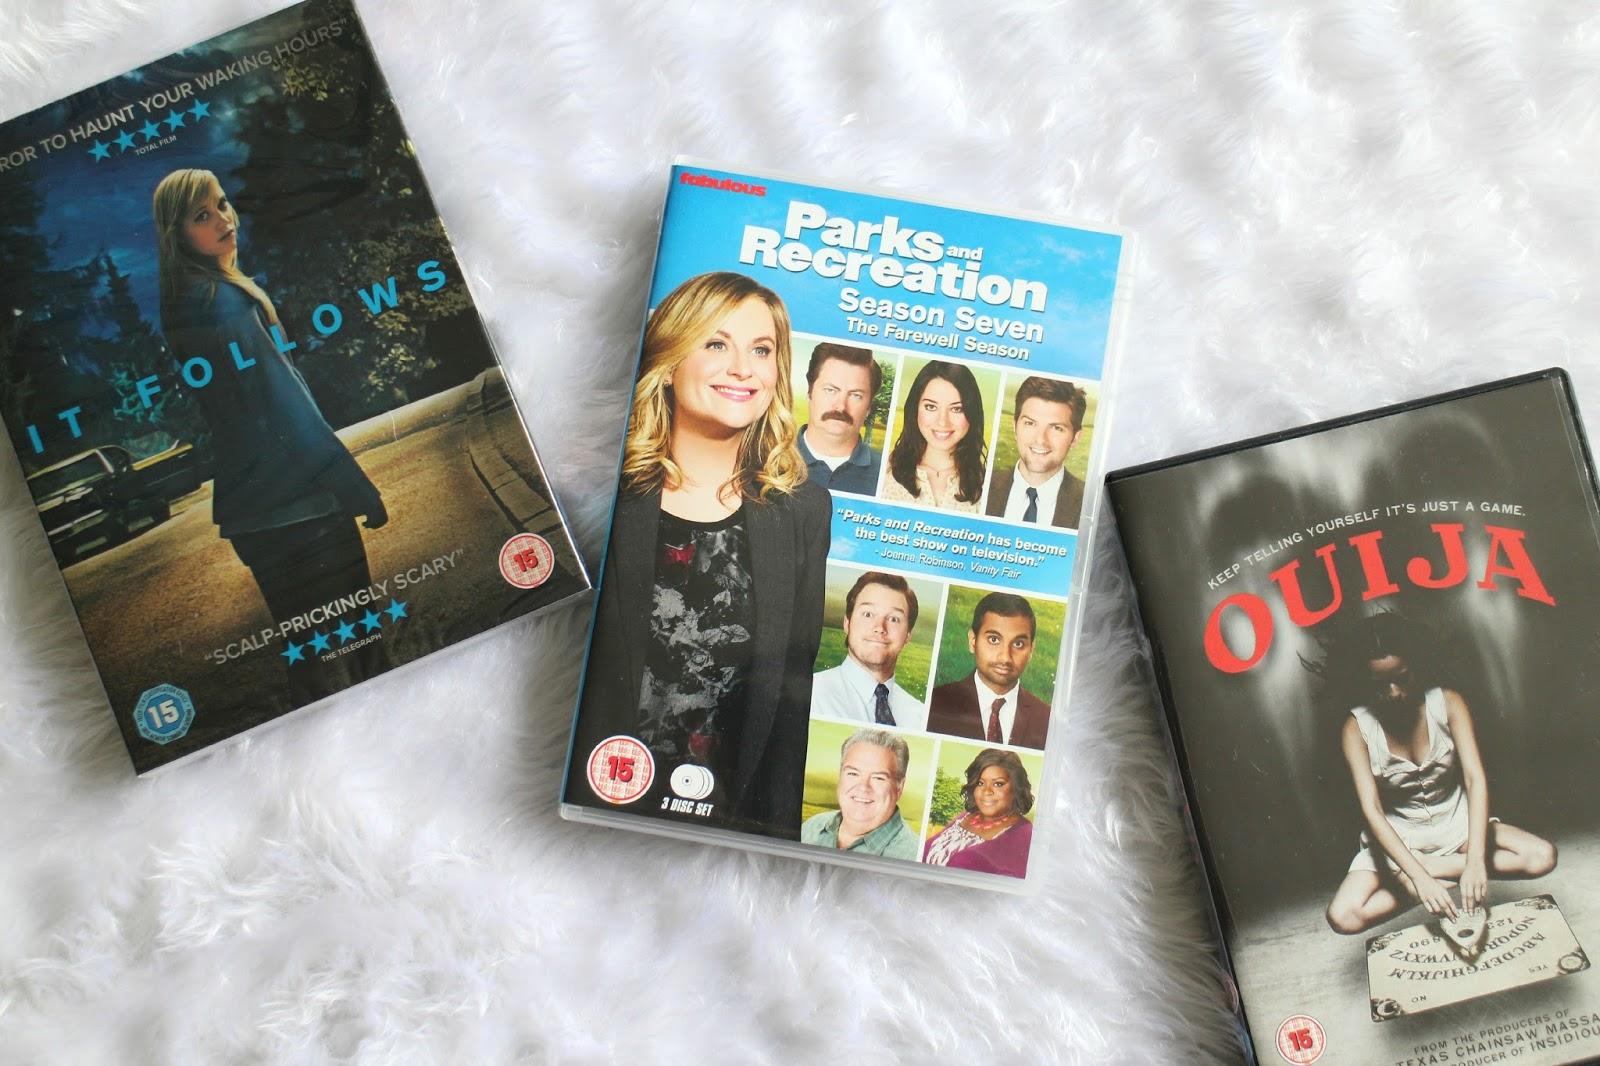 Amazon DVD Haul 2015